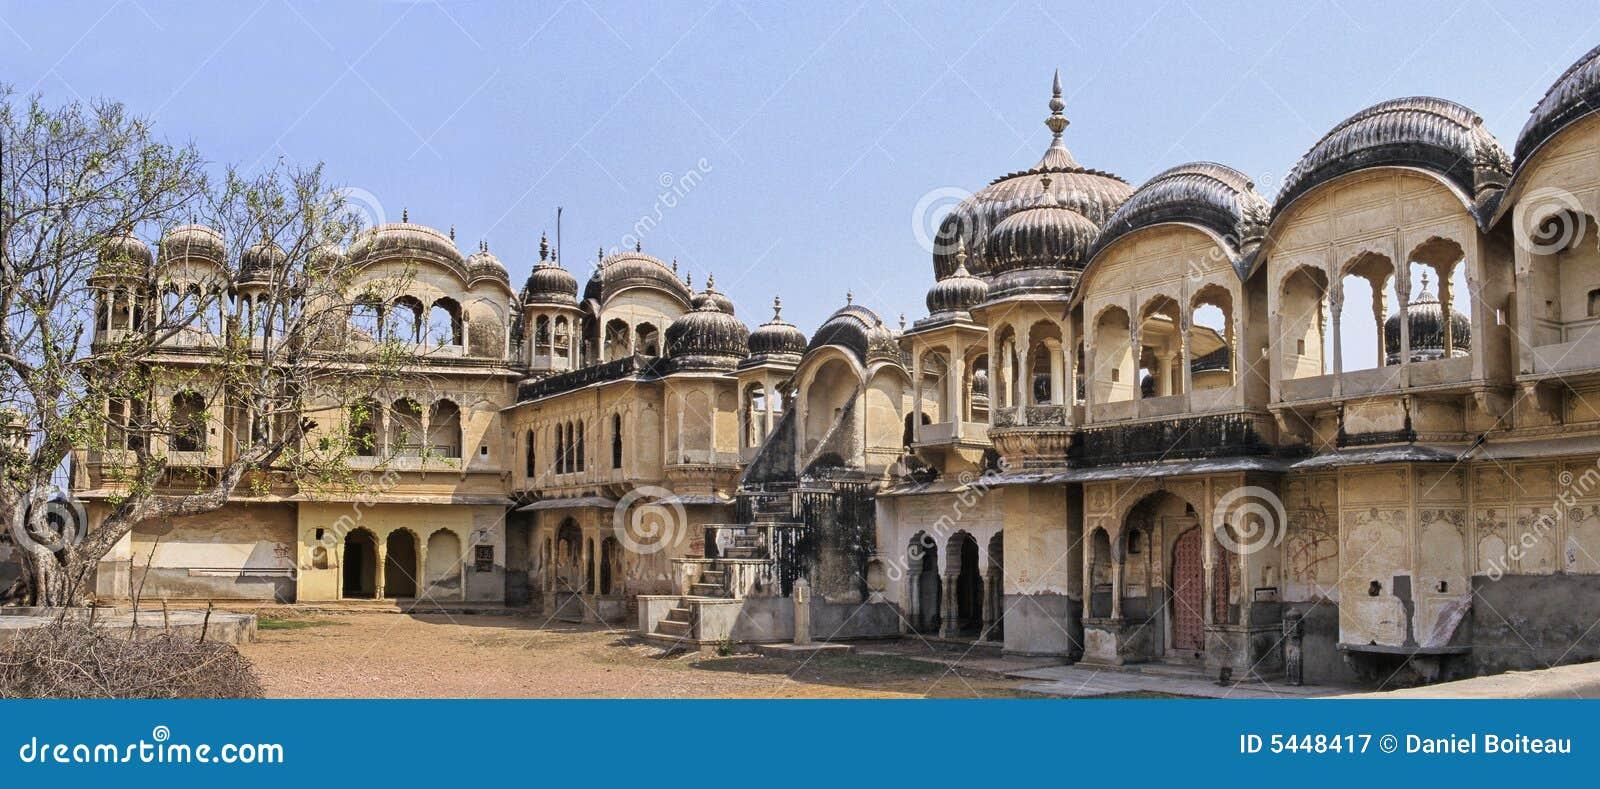 Het paleis van Shekhawati